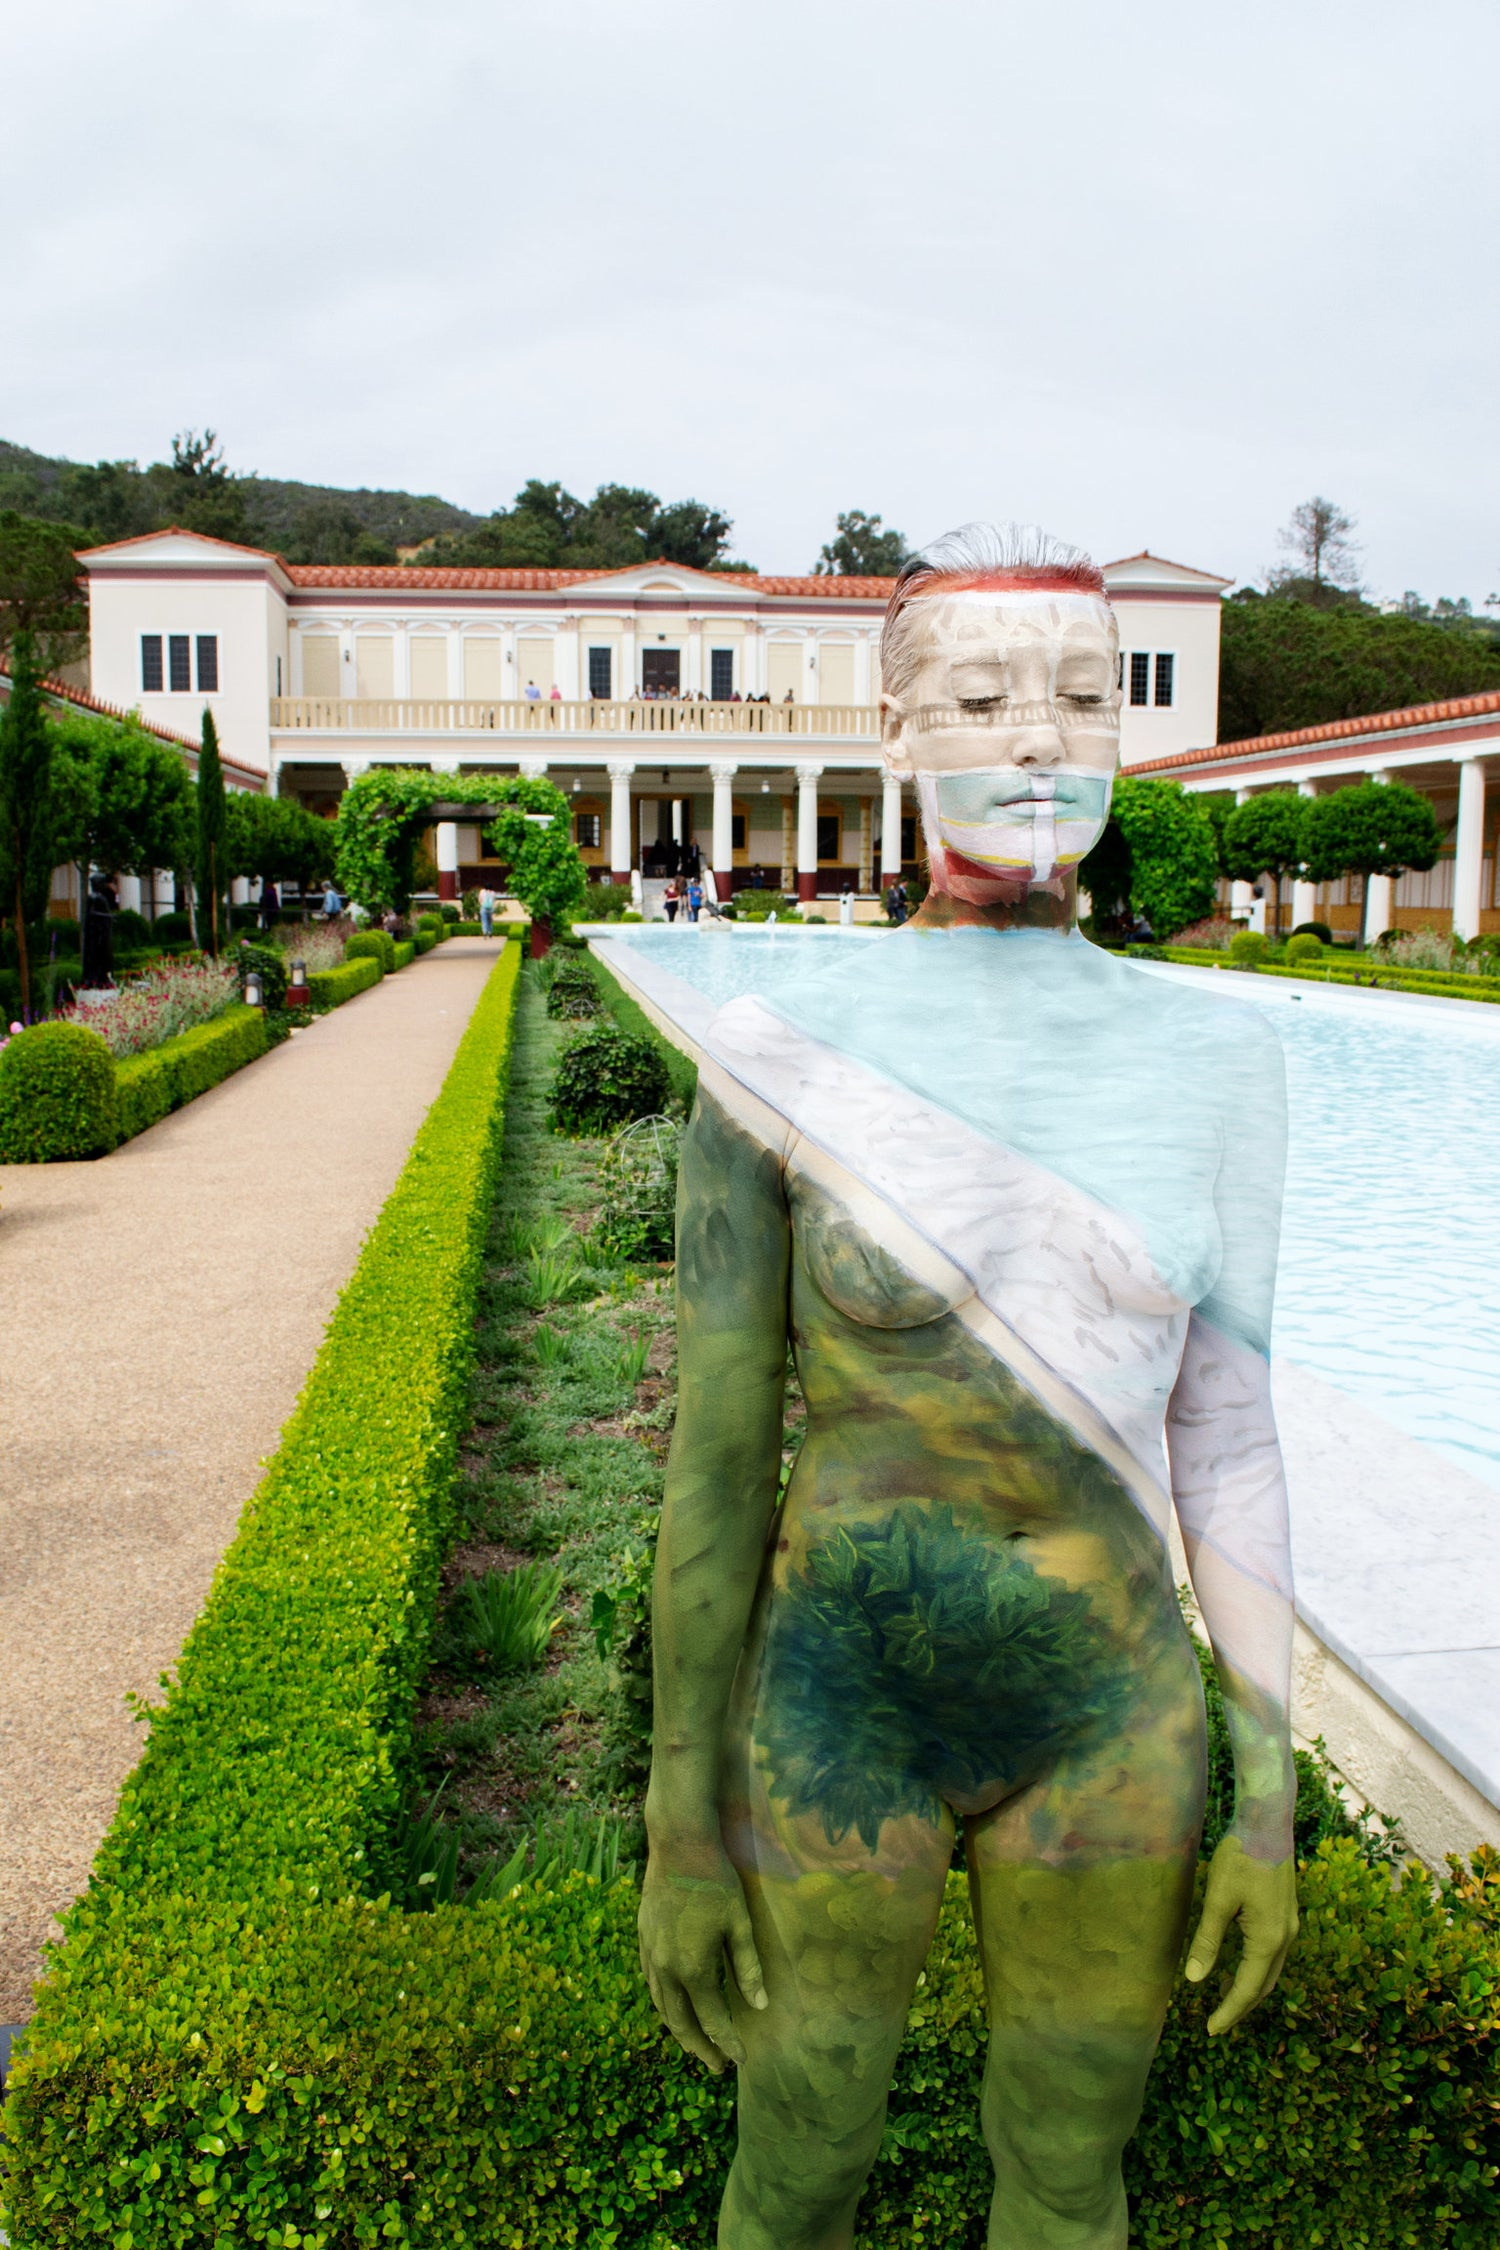 Image of Getty Villa Pool